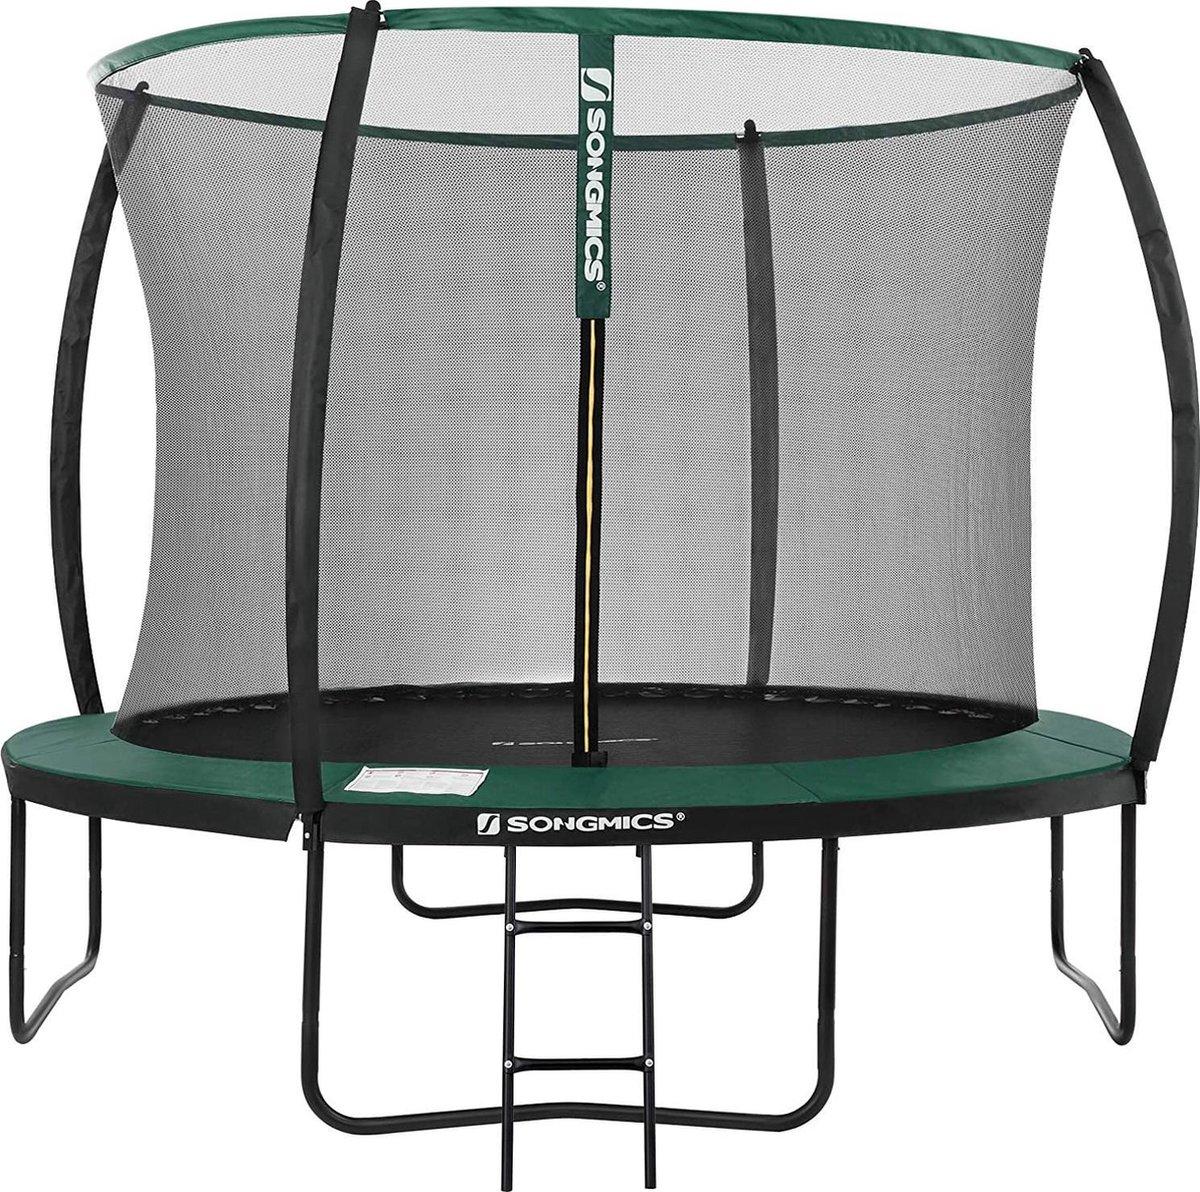 Trampoline met Veiligheidsnet - Ø 305 cm - met Ladder - Buiten - Veilig - Groen